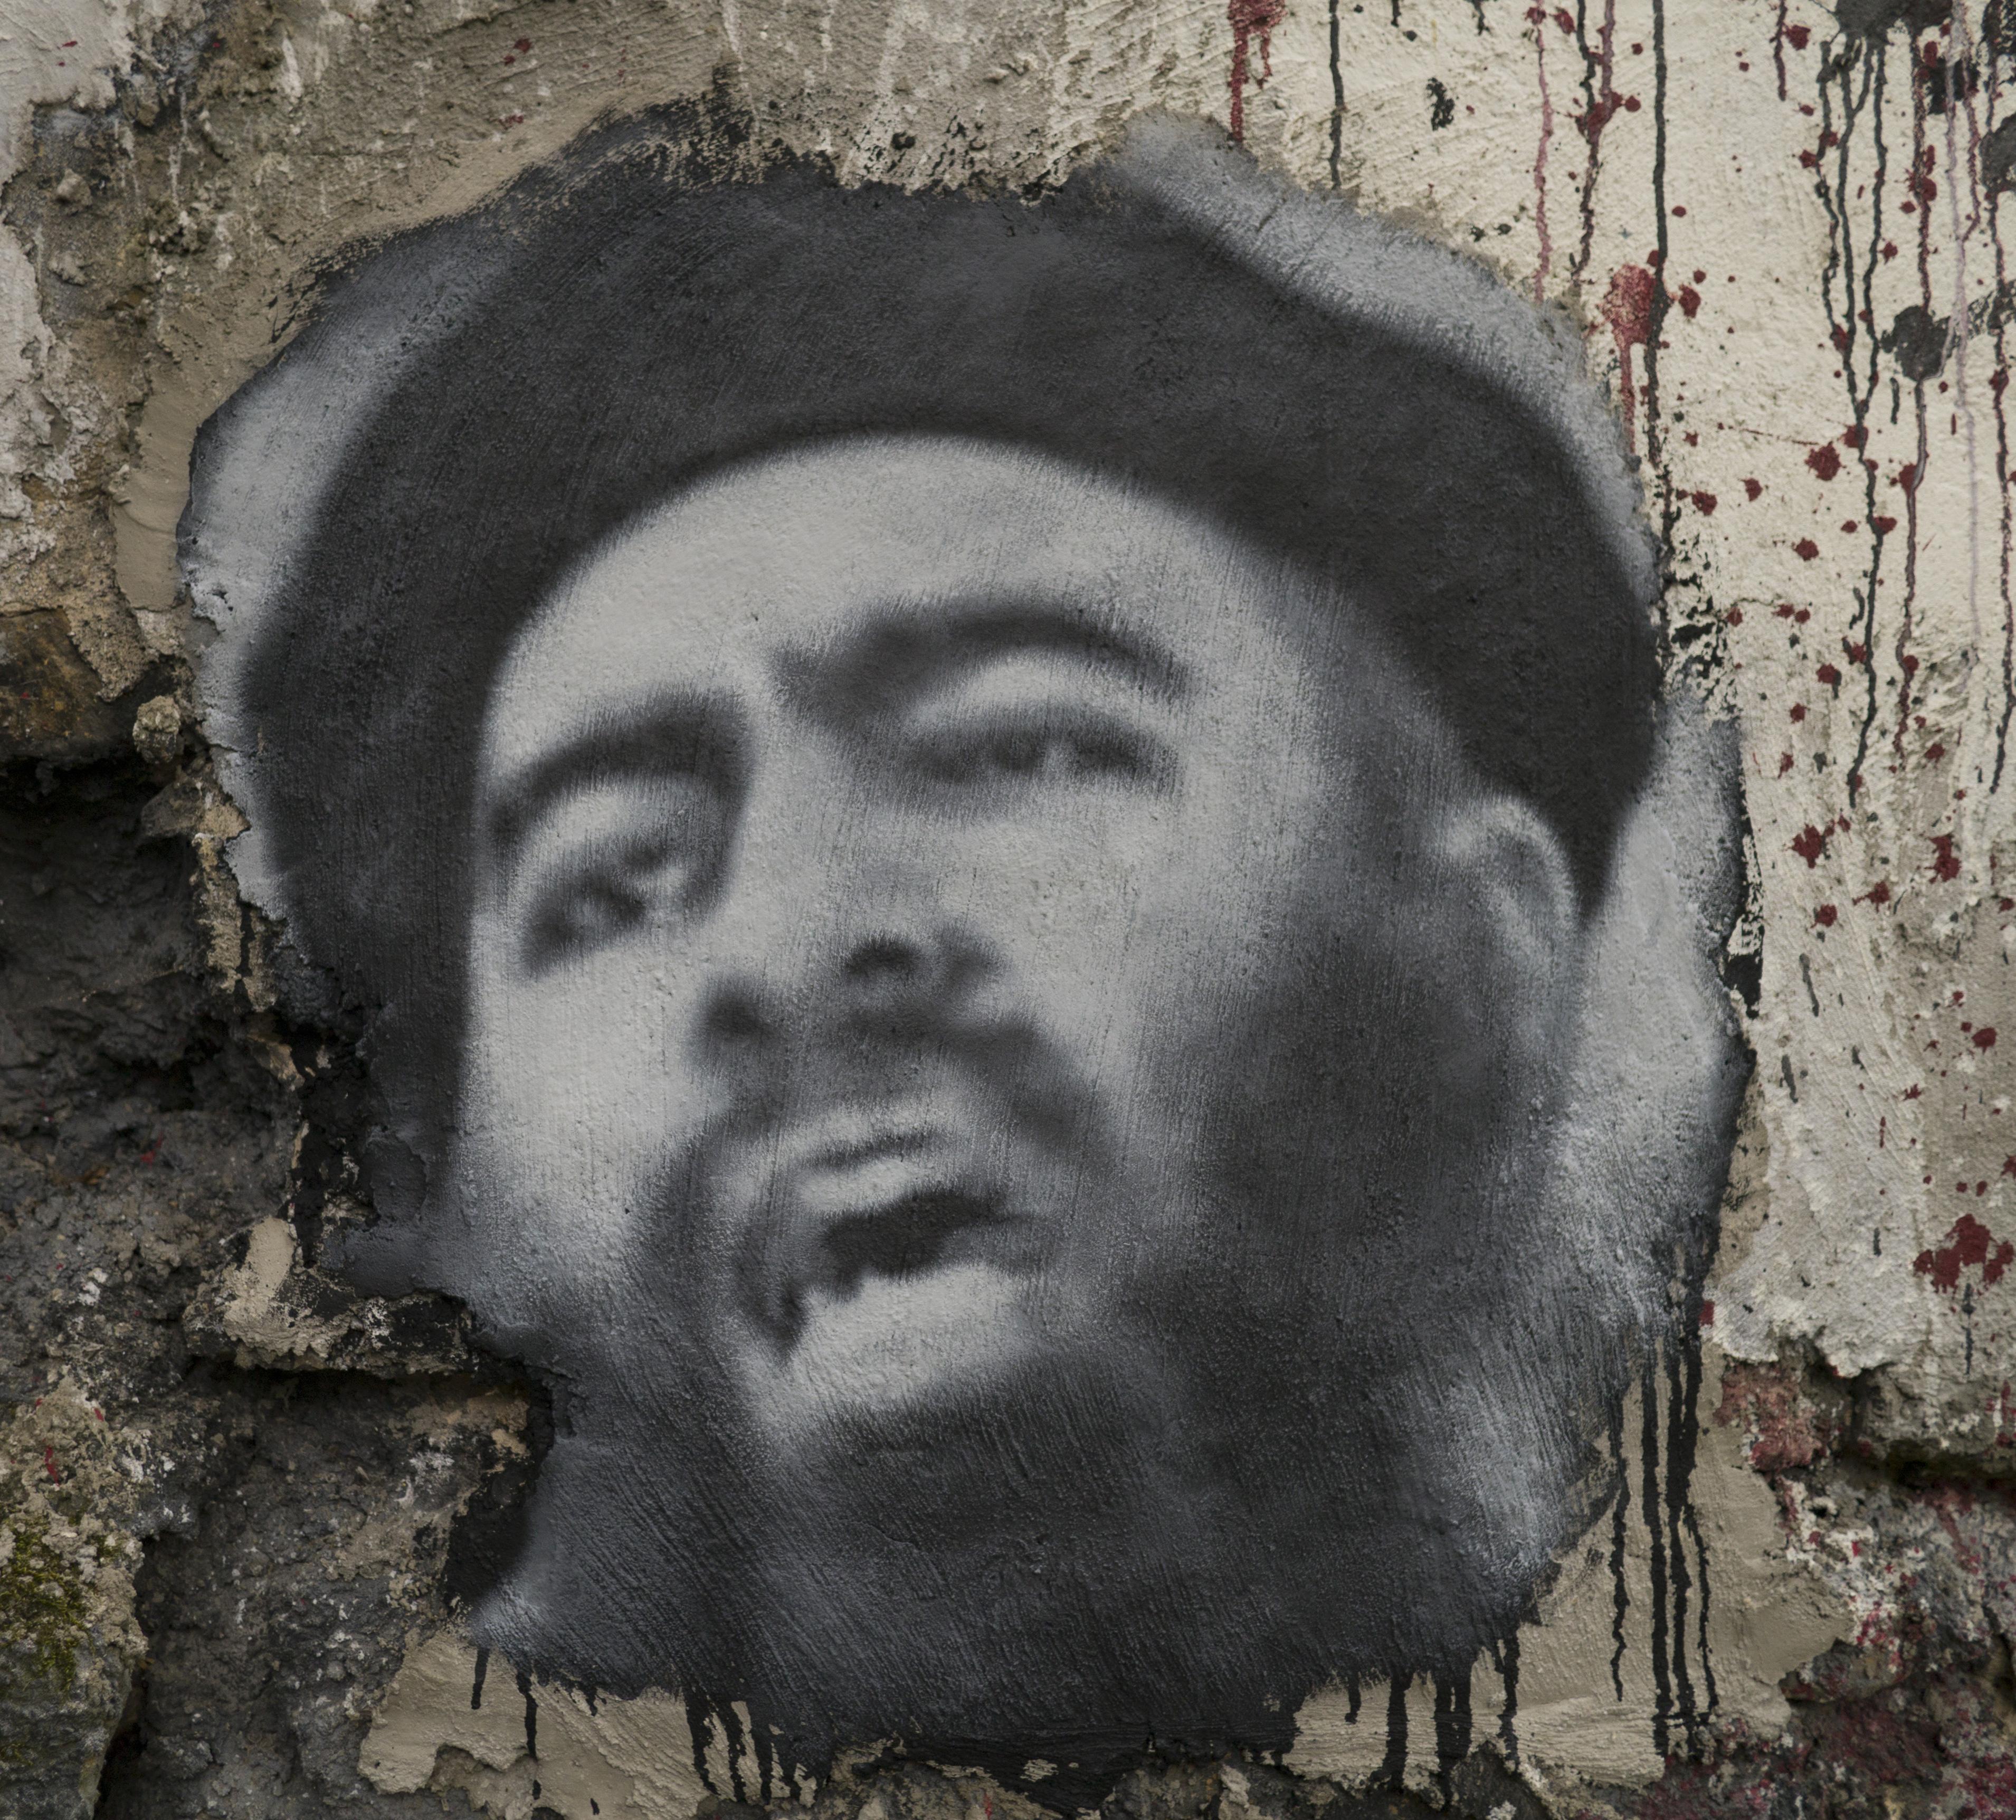 Grafitti of al-Baghdadi, the leader of Islamic State.